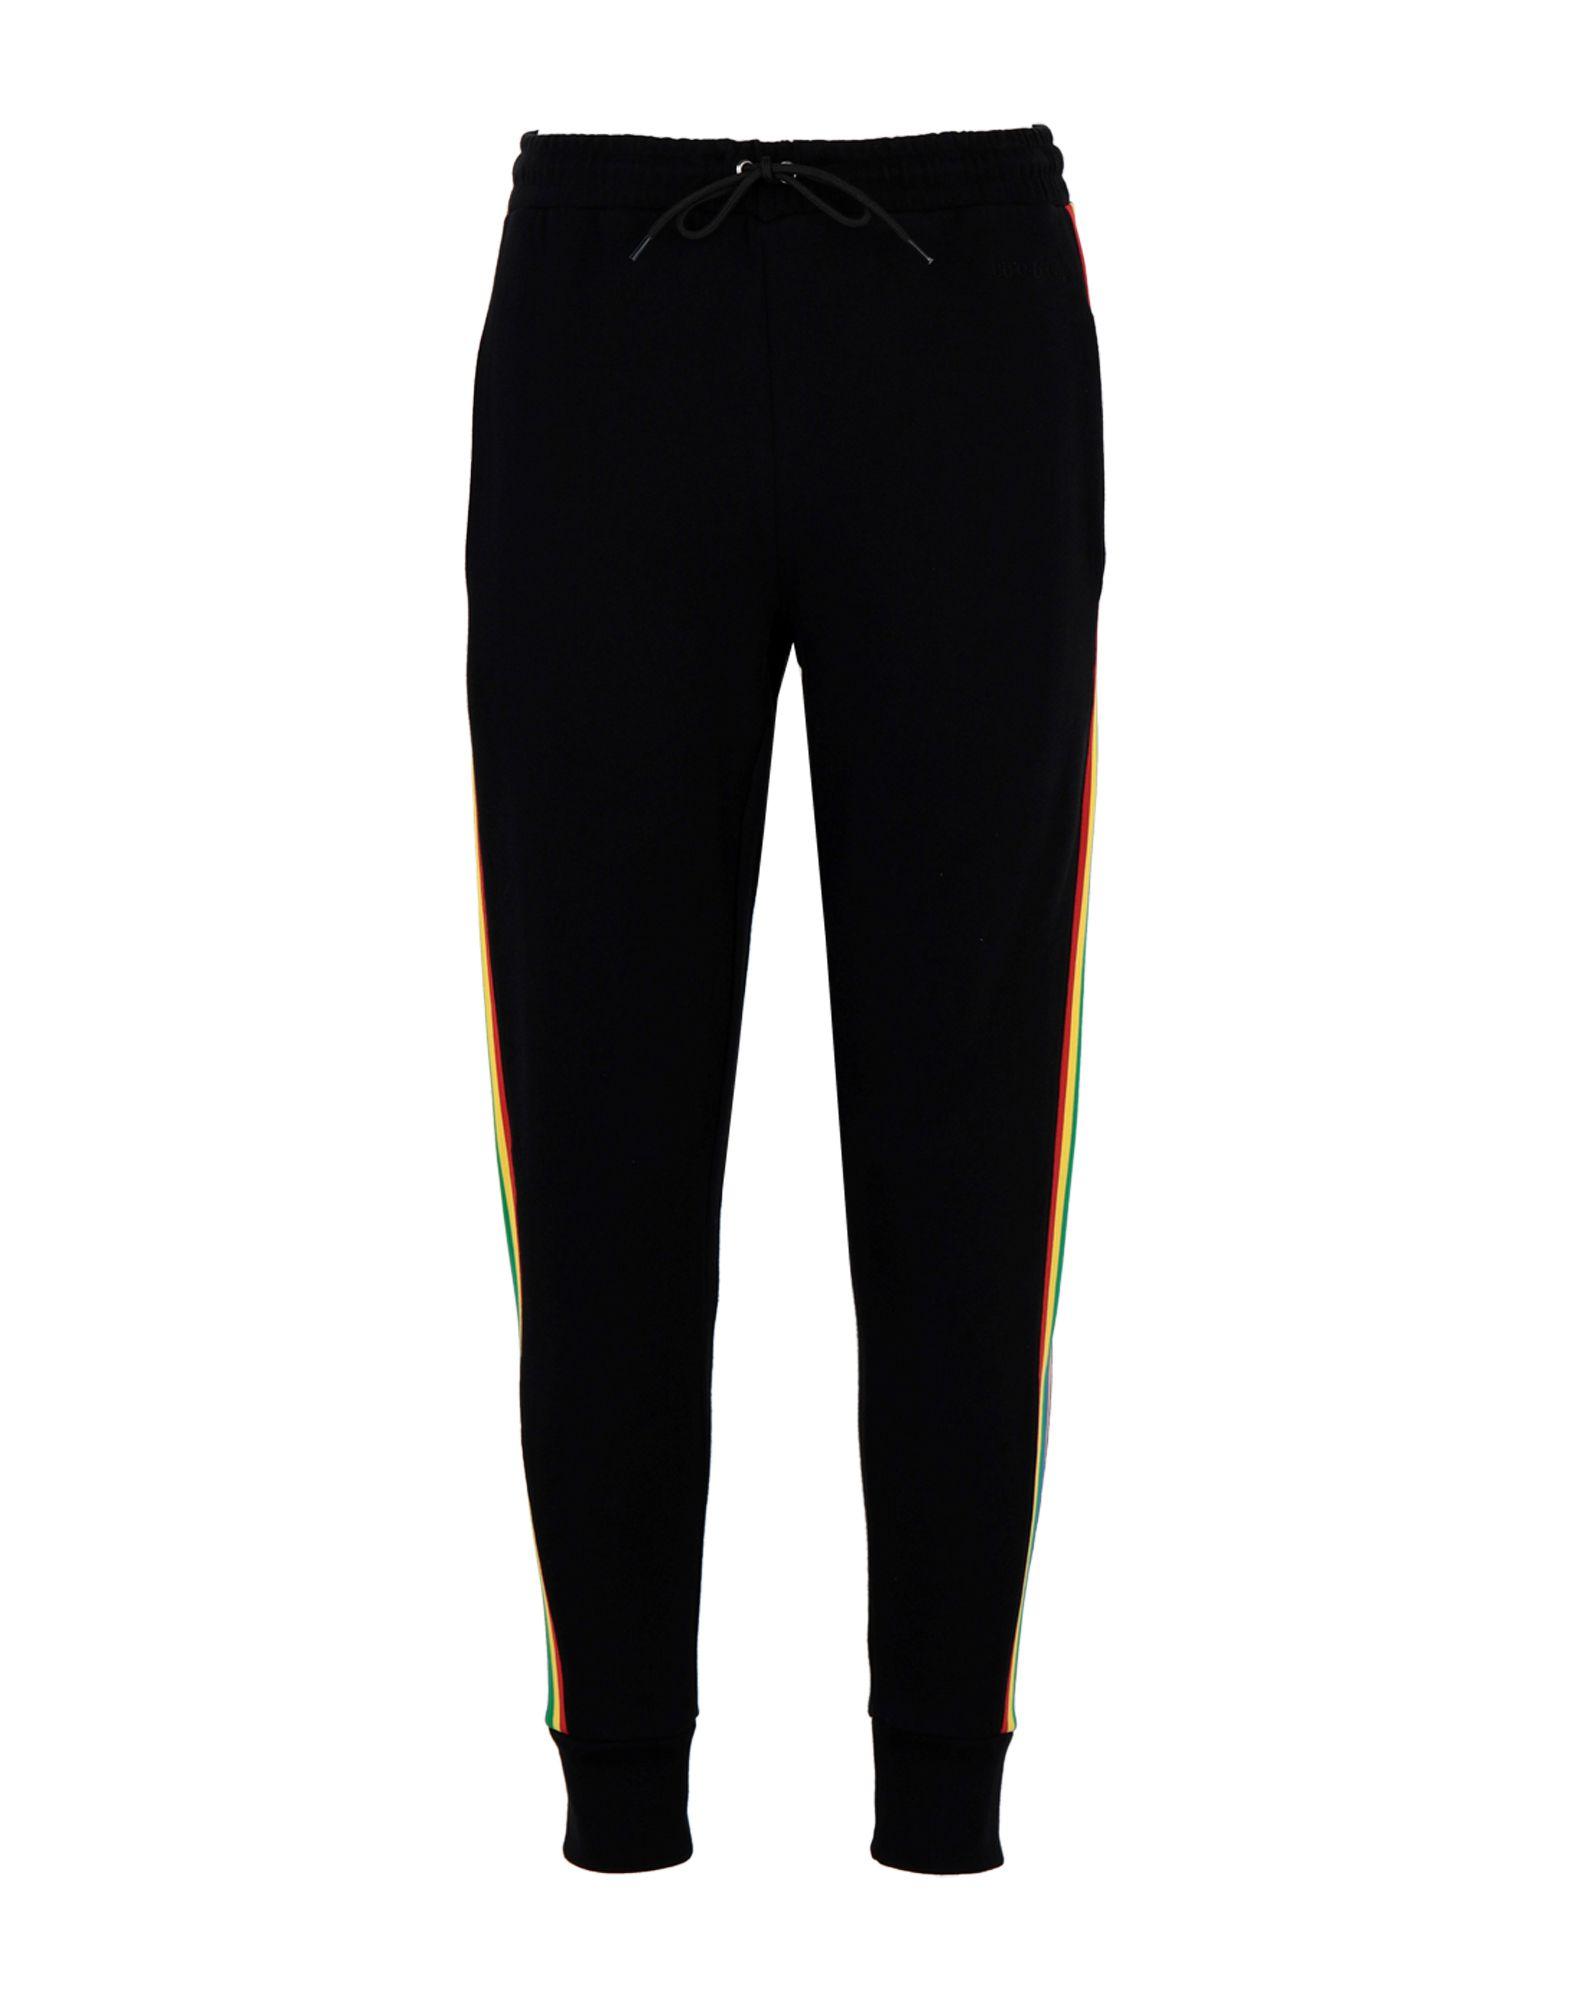 Pantalone Être Cécile Rib Fleece Track Pants - damen - 13253303PC